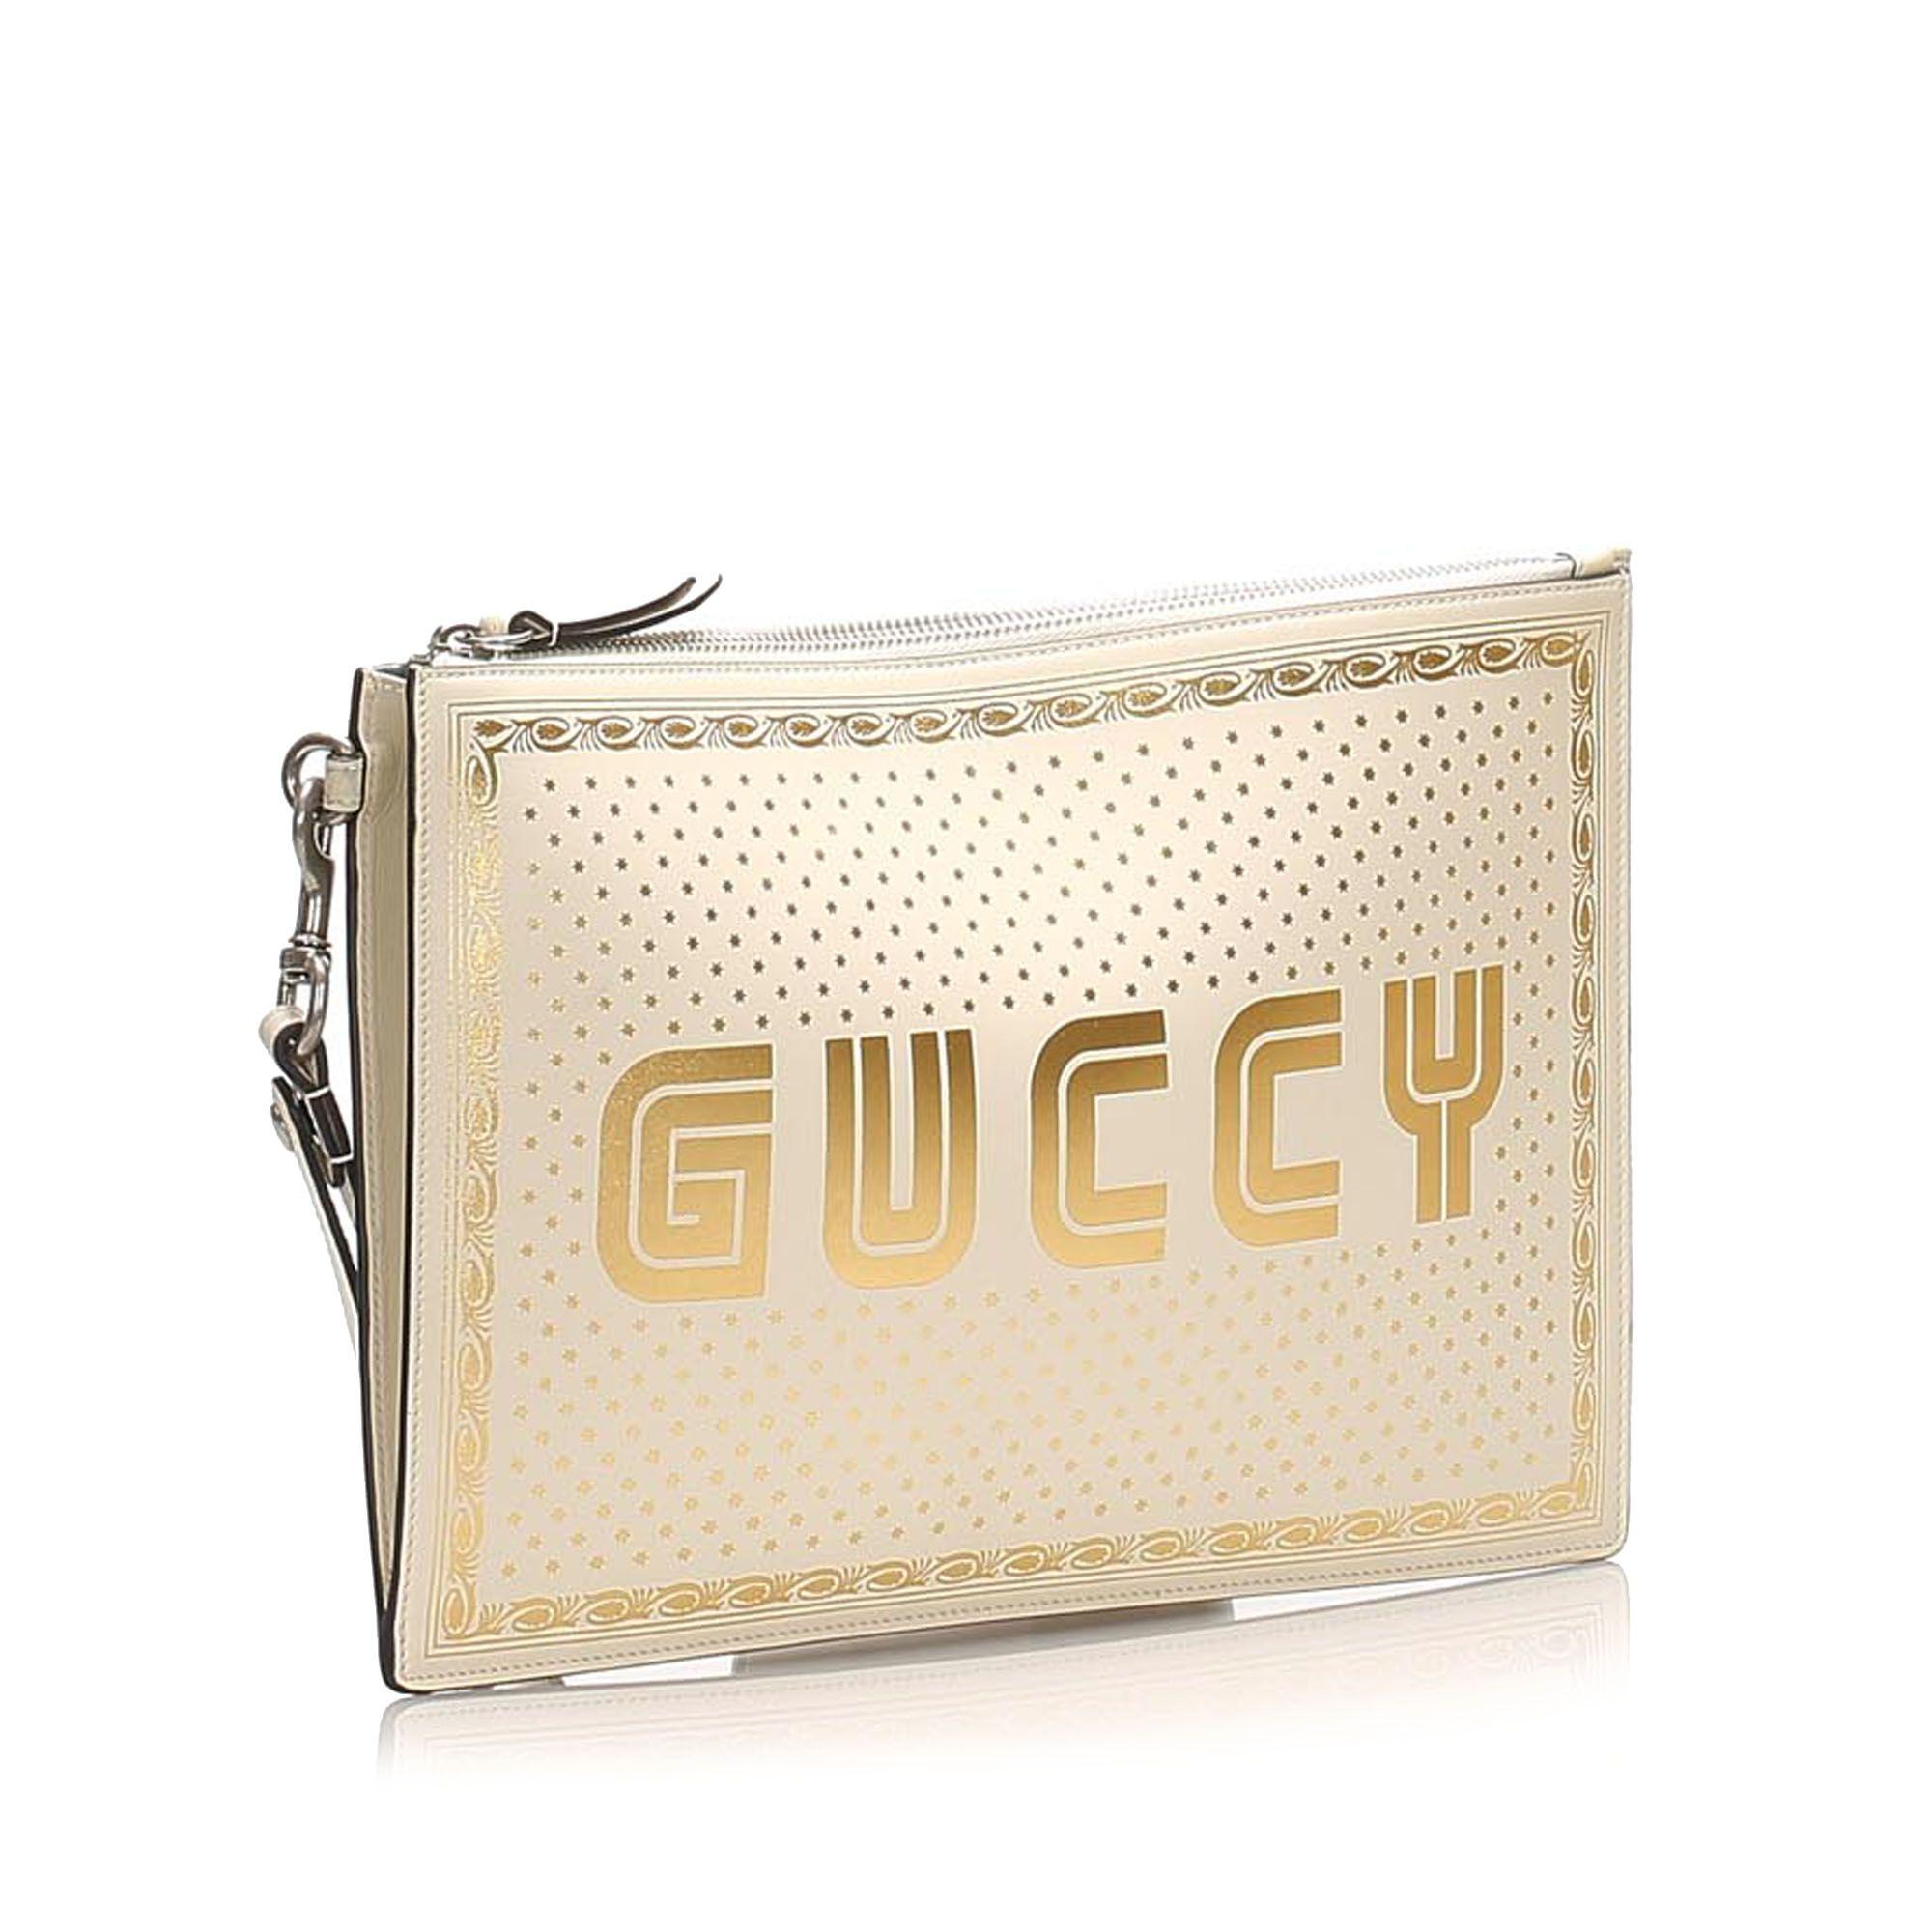 Vintage Gucci Guccy Sega Leather Clutch Bag White